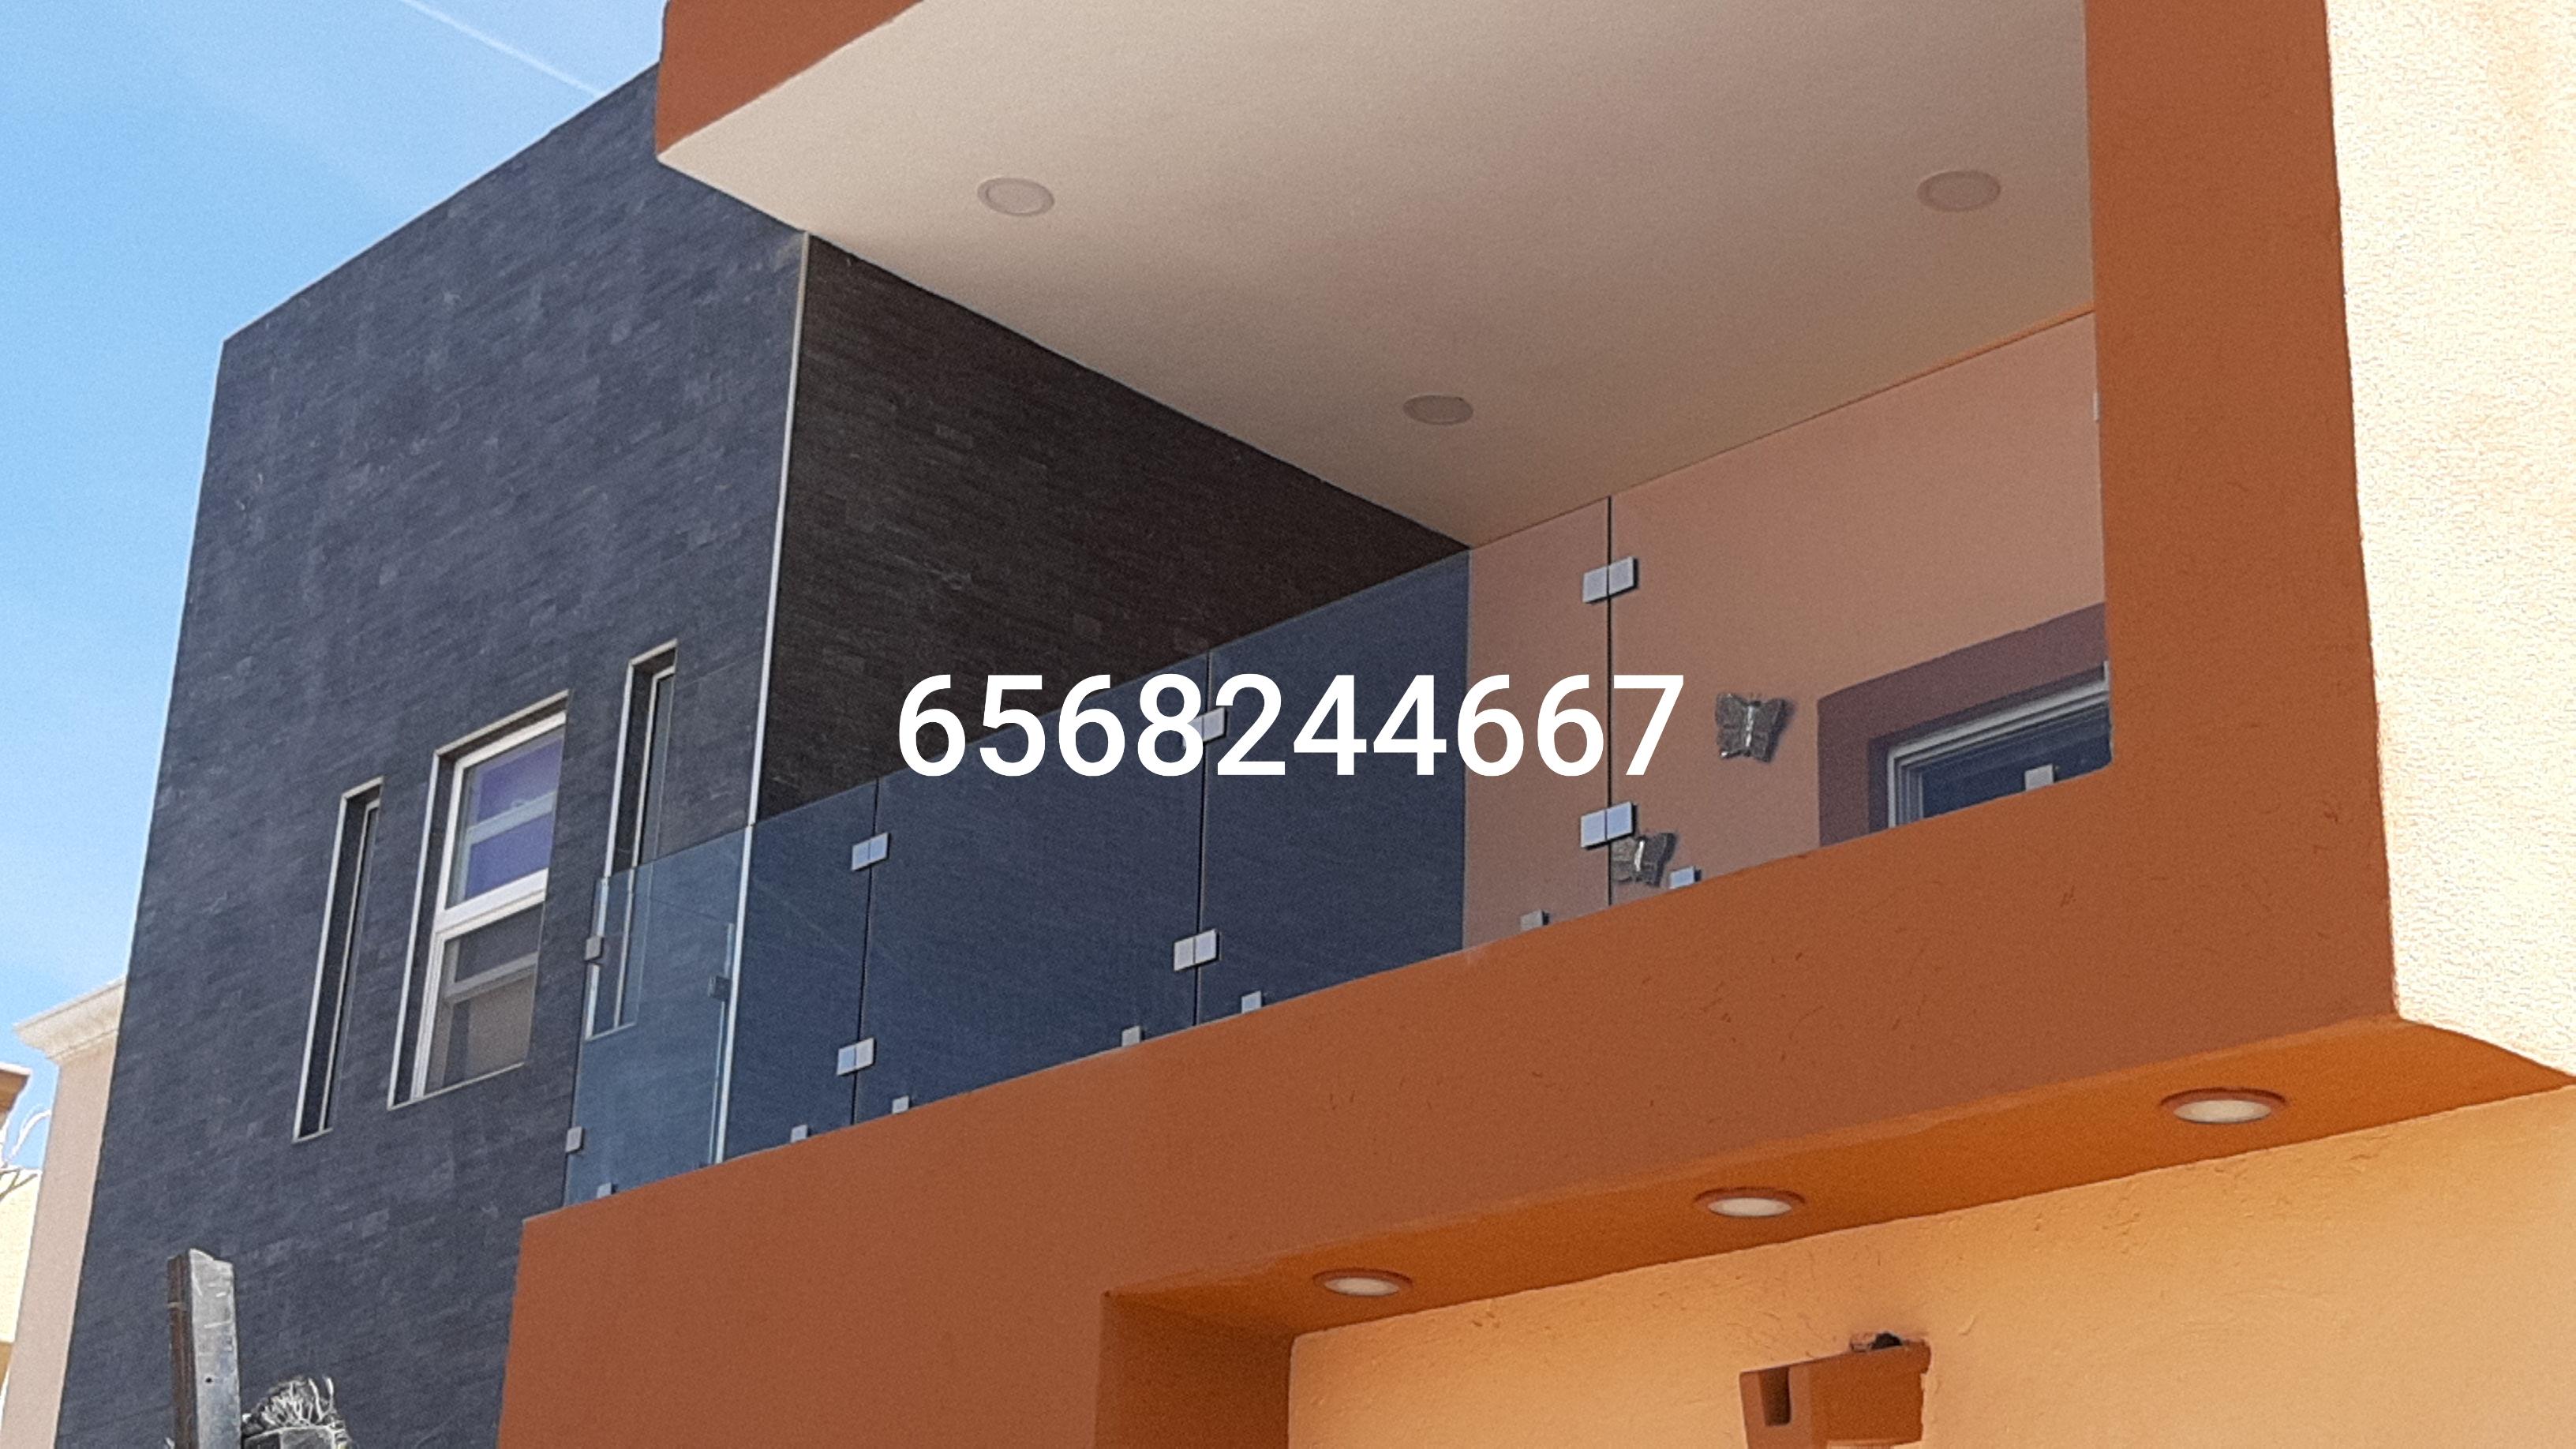 20200421_145821